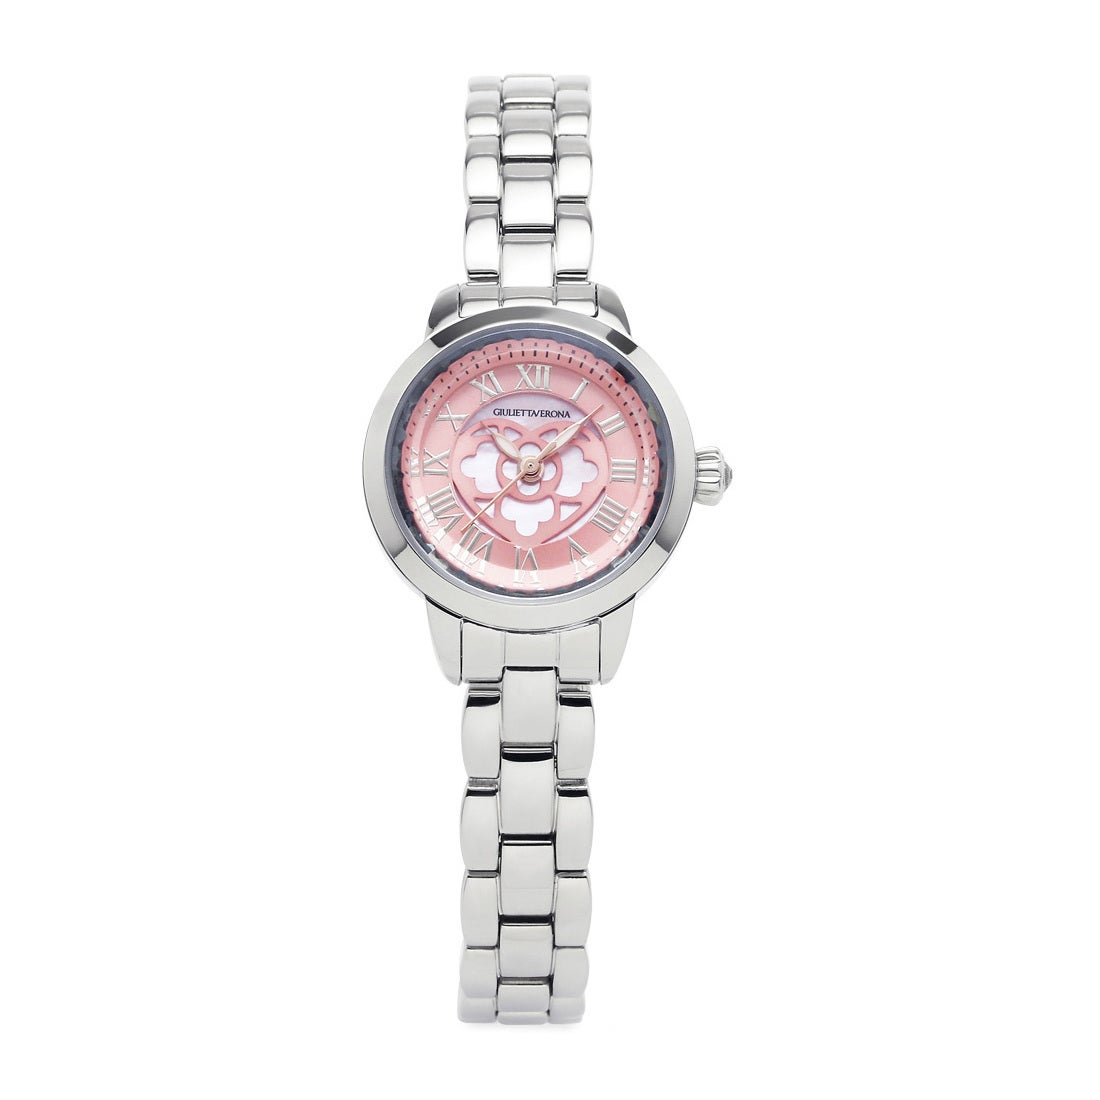 【SAC'S BAR】ジュリエッタヴェローナ GIULIETTAVERONA 腕時計 GV003S LOVE VERONA ピンク×シルバー